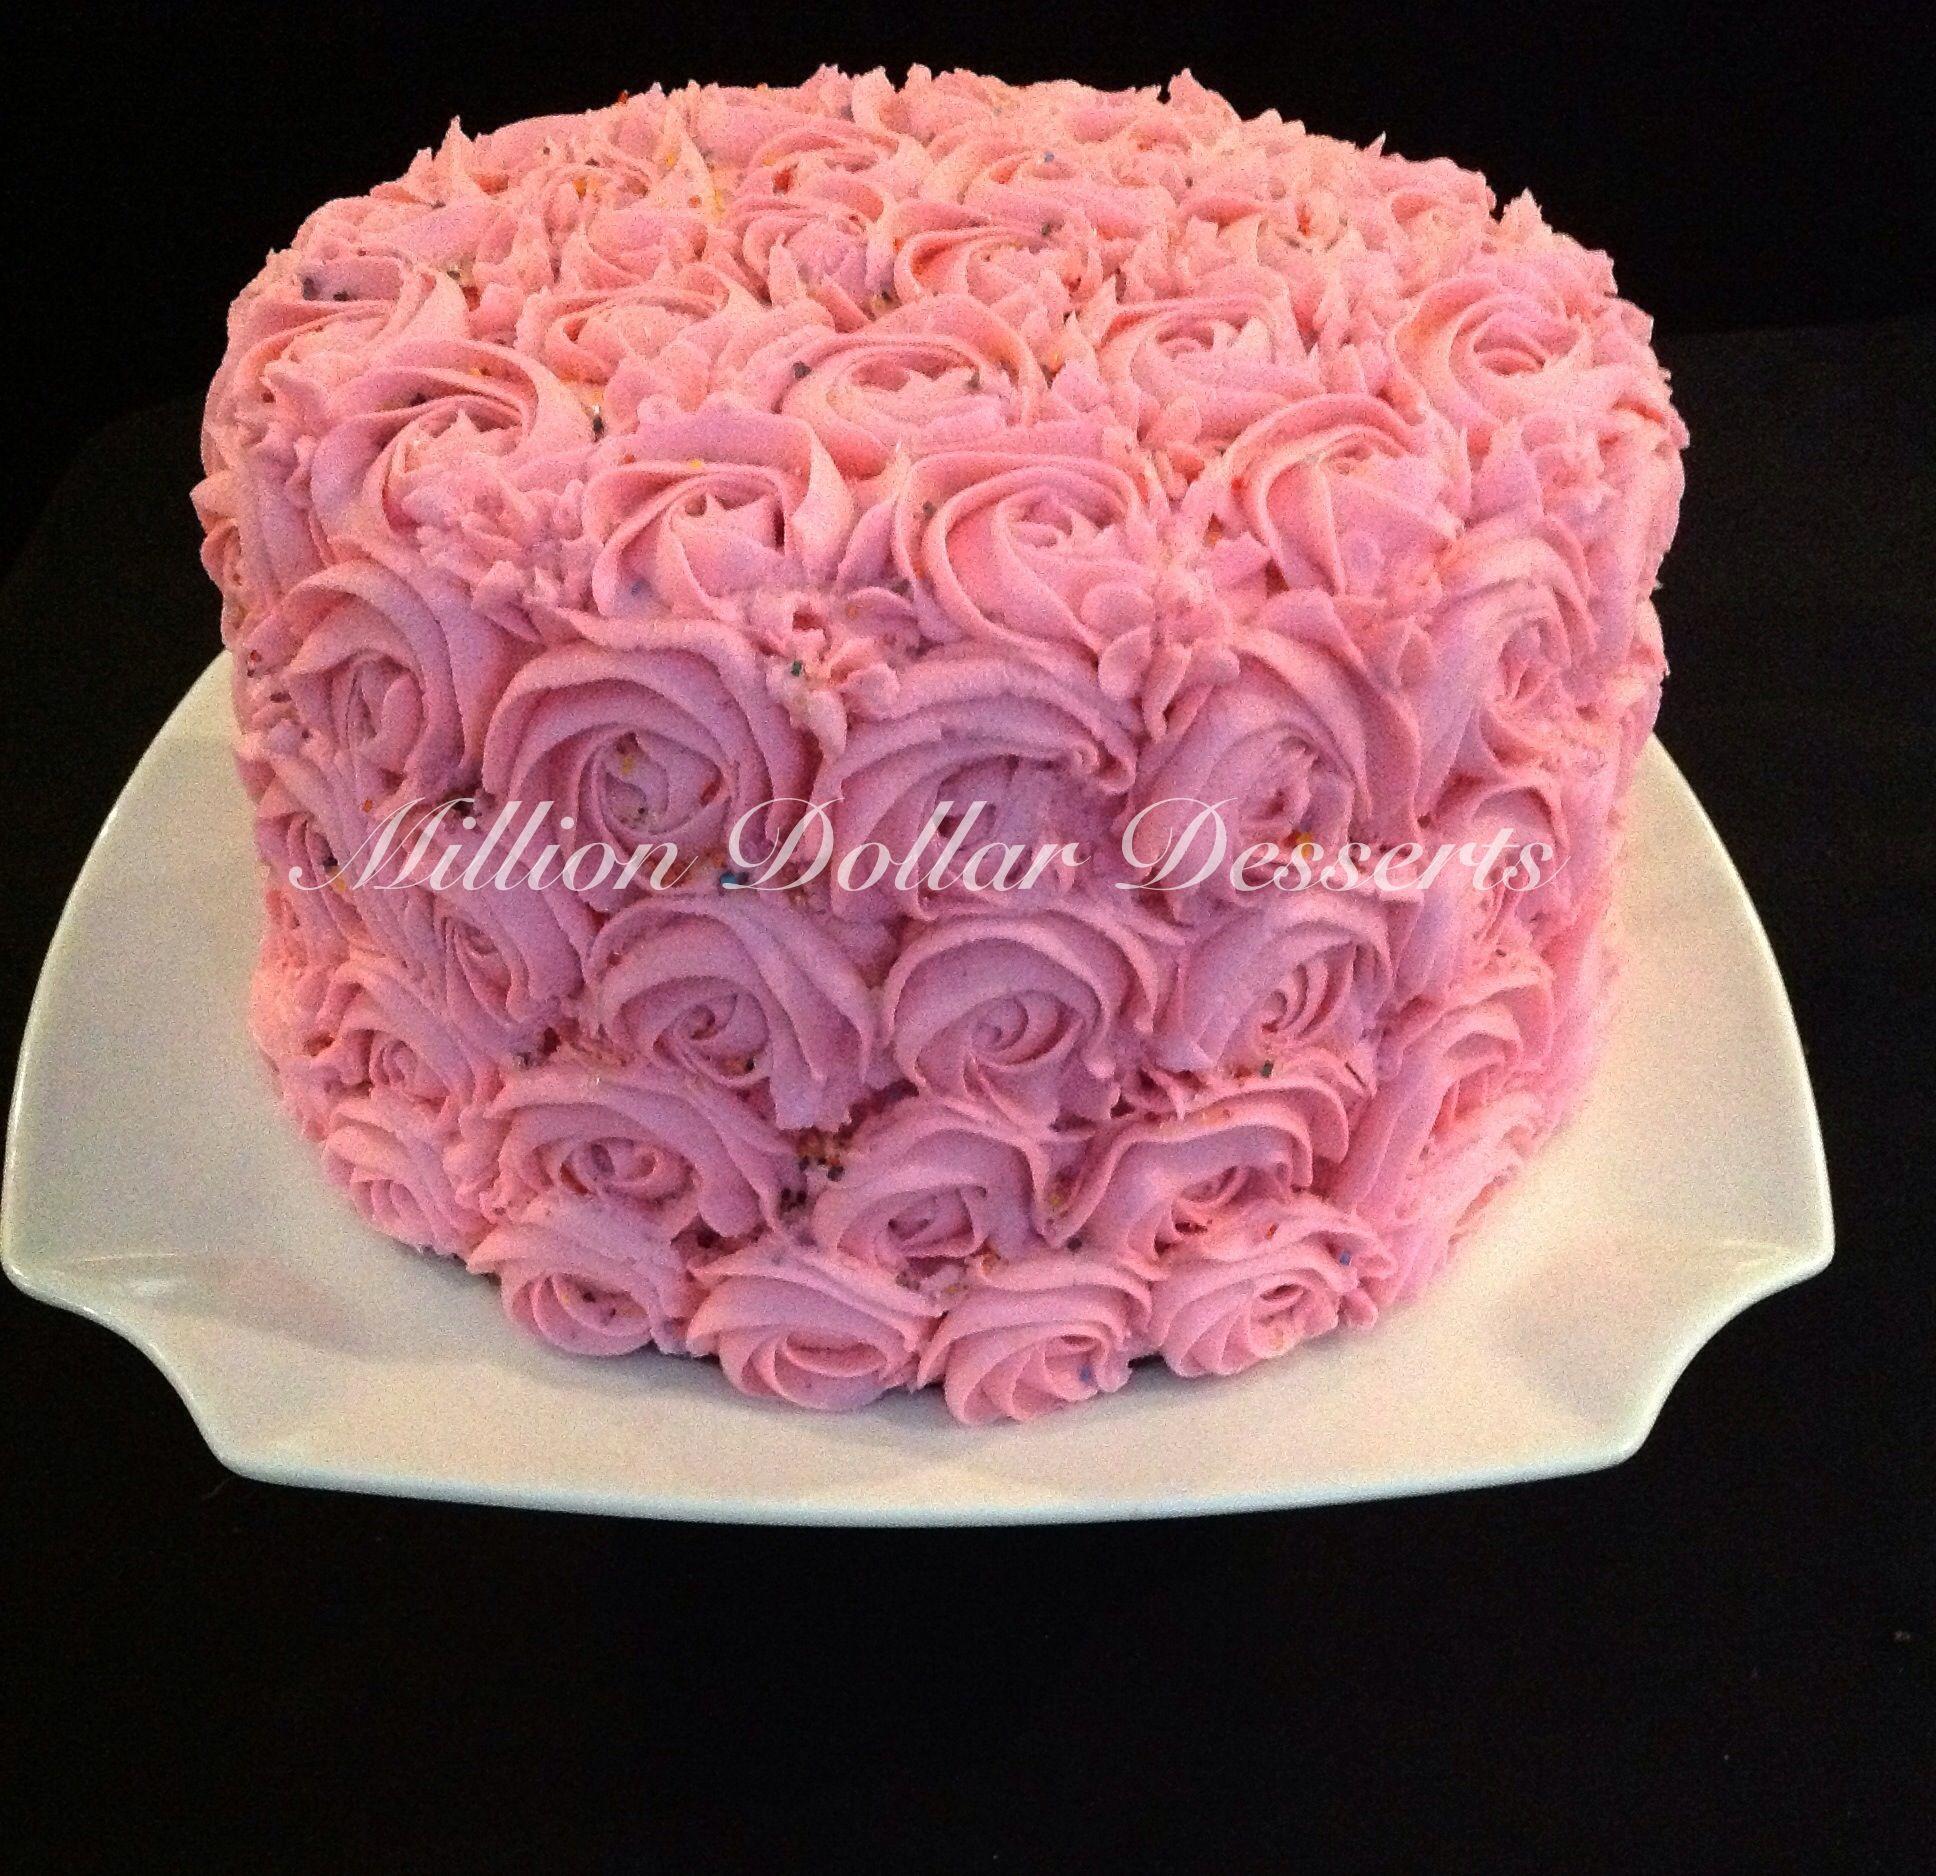 Rosette Cake My absolute favorite!!!!